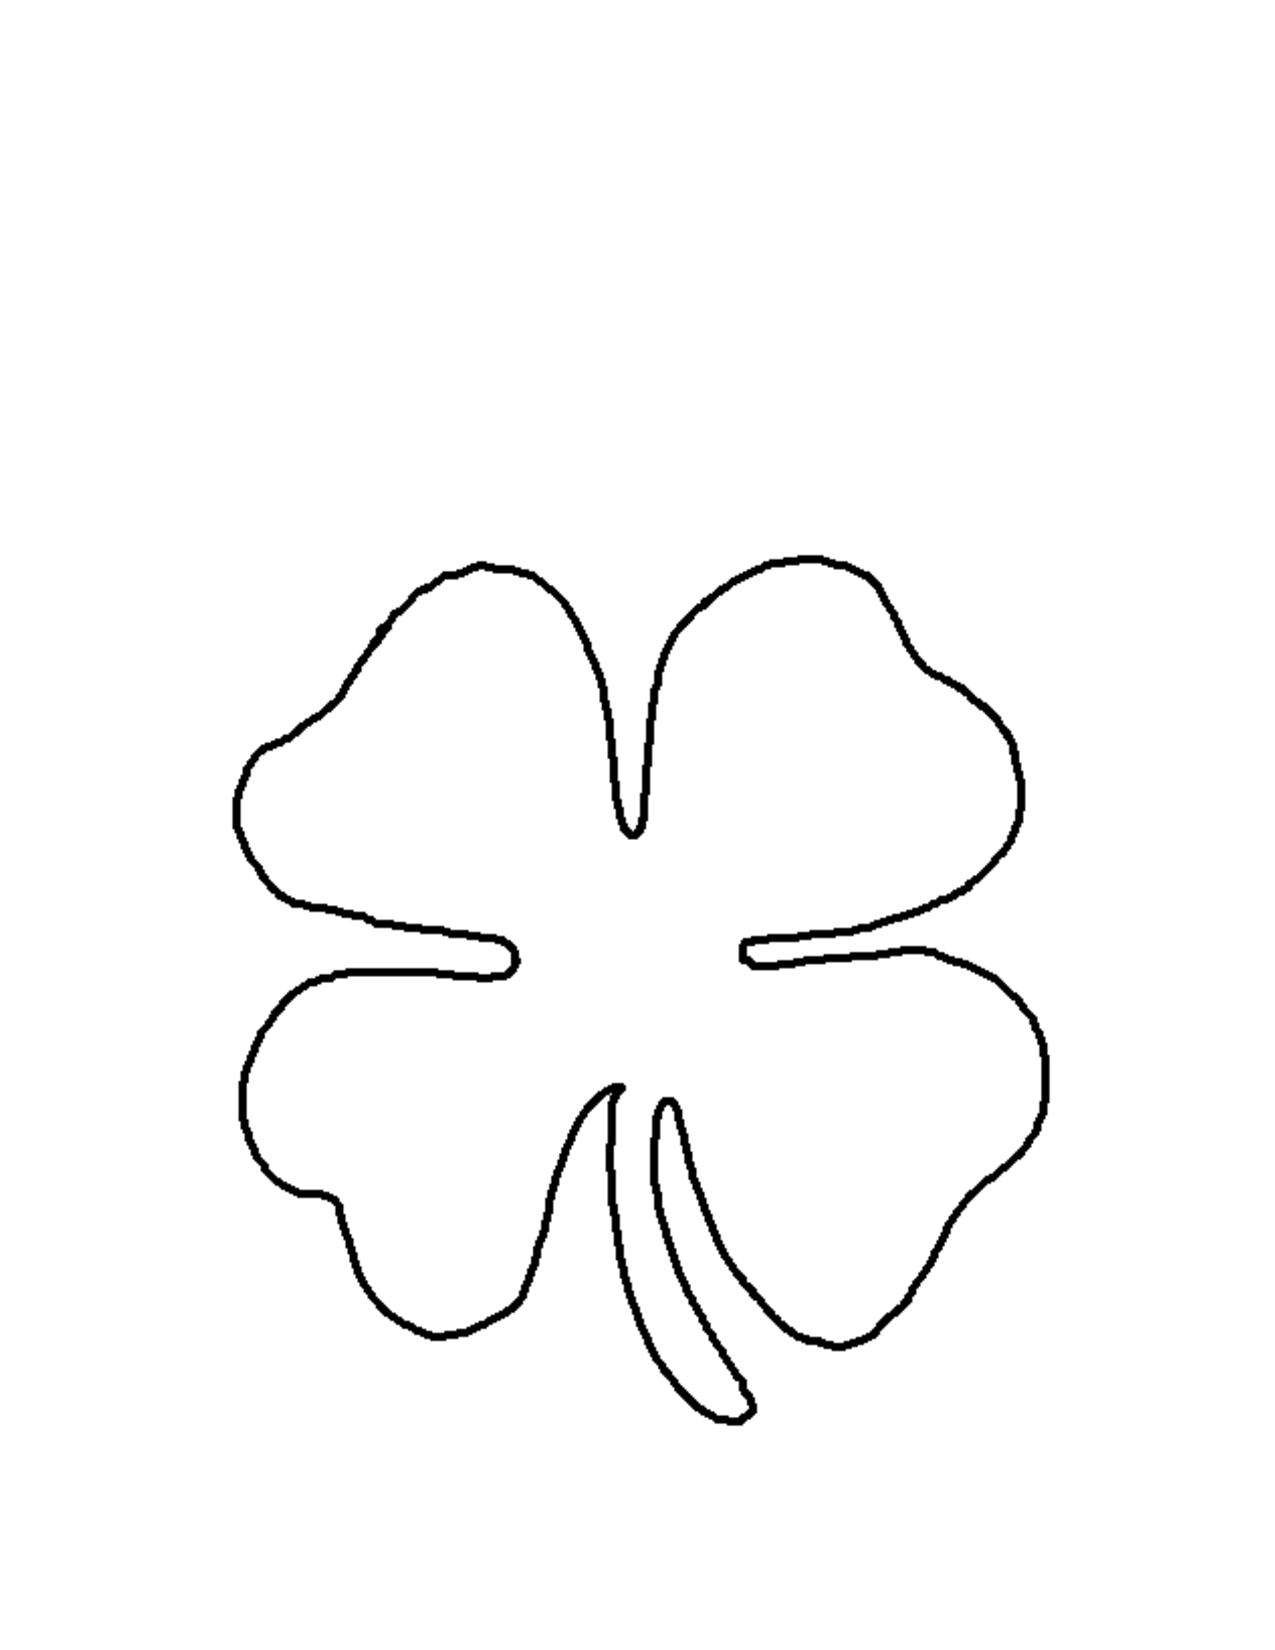 1275x1650 Outline Shamrock Tattoos